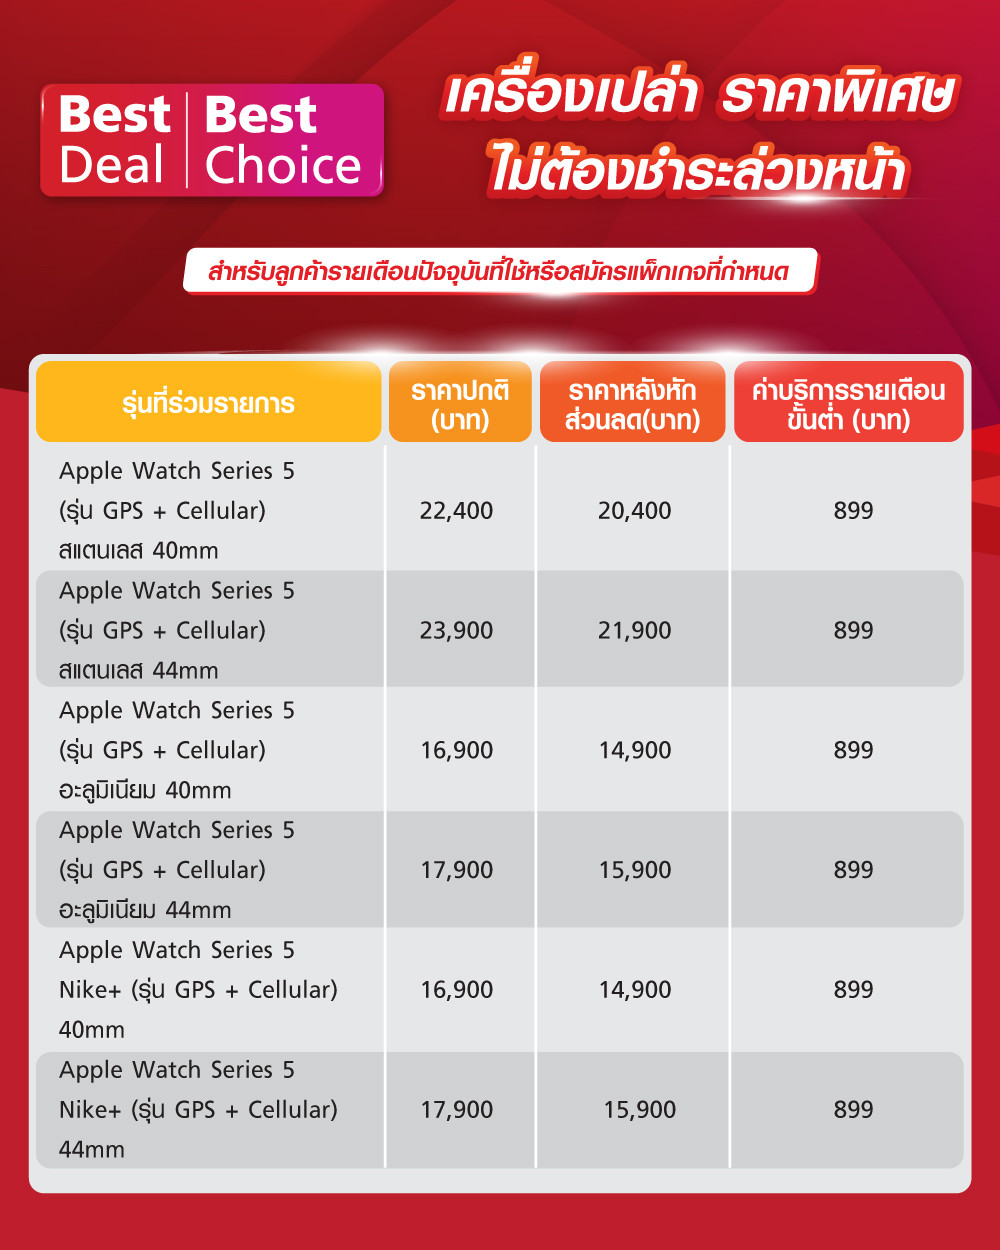 best-deal-best-choice_applewatch.jpg